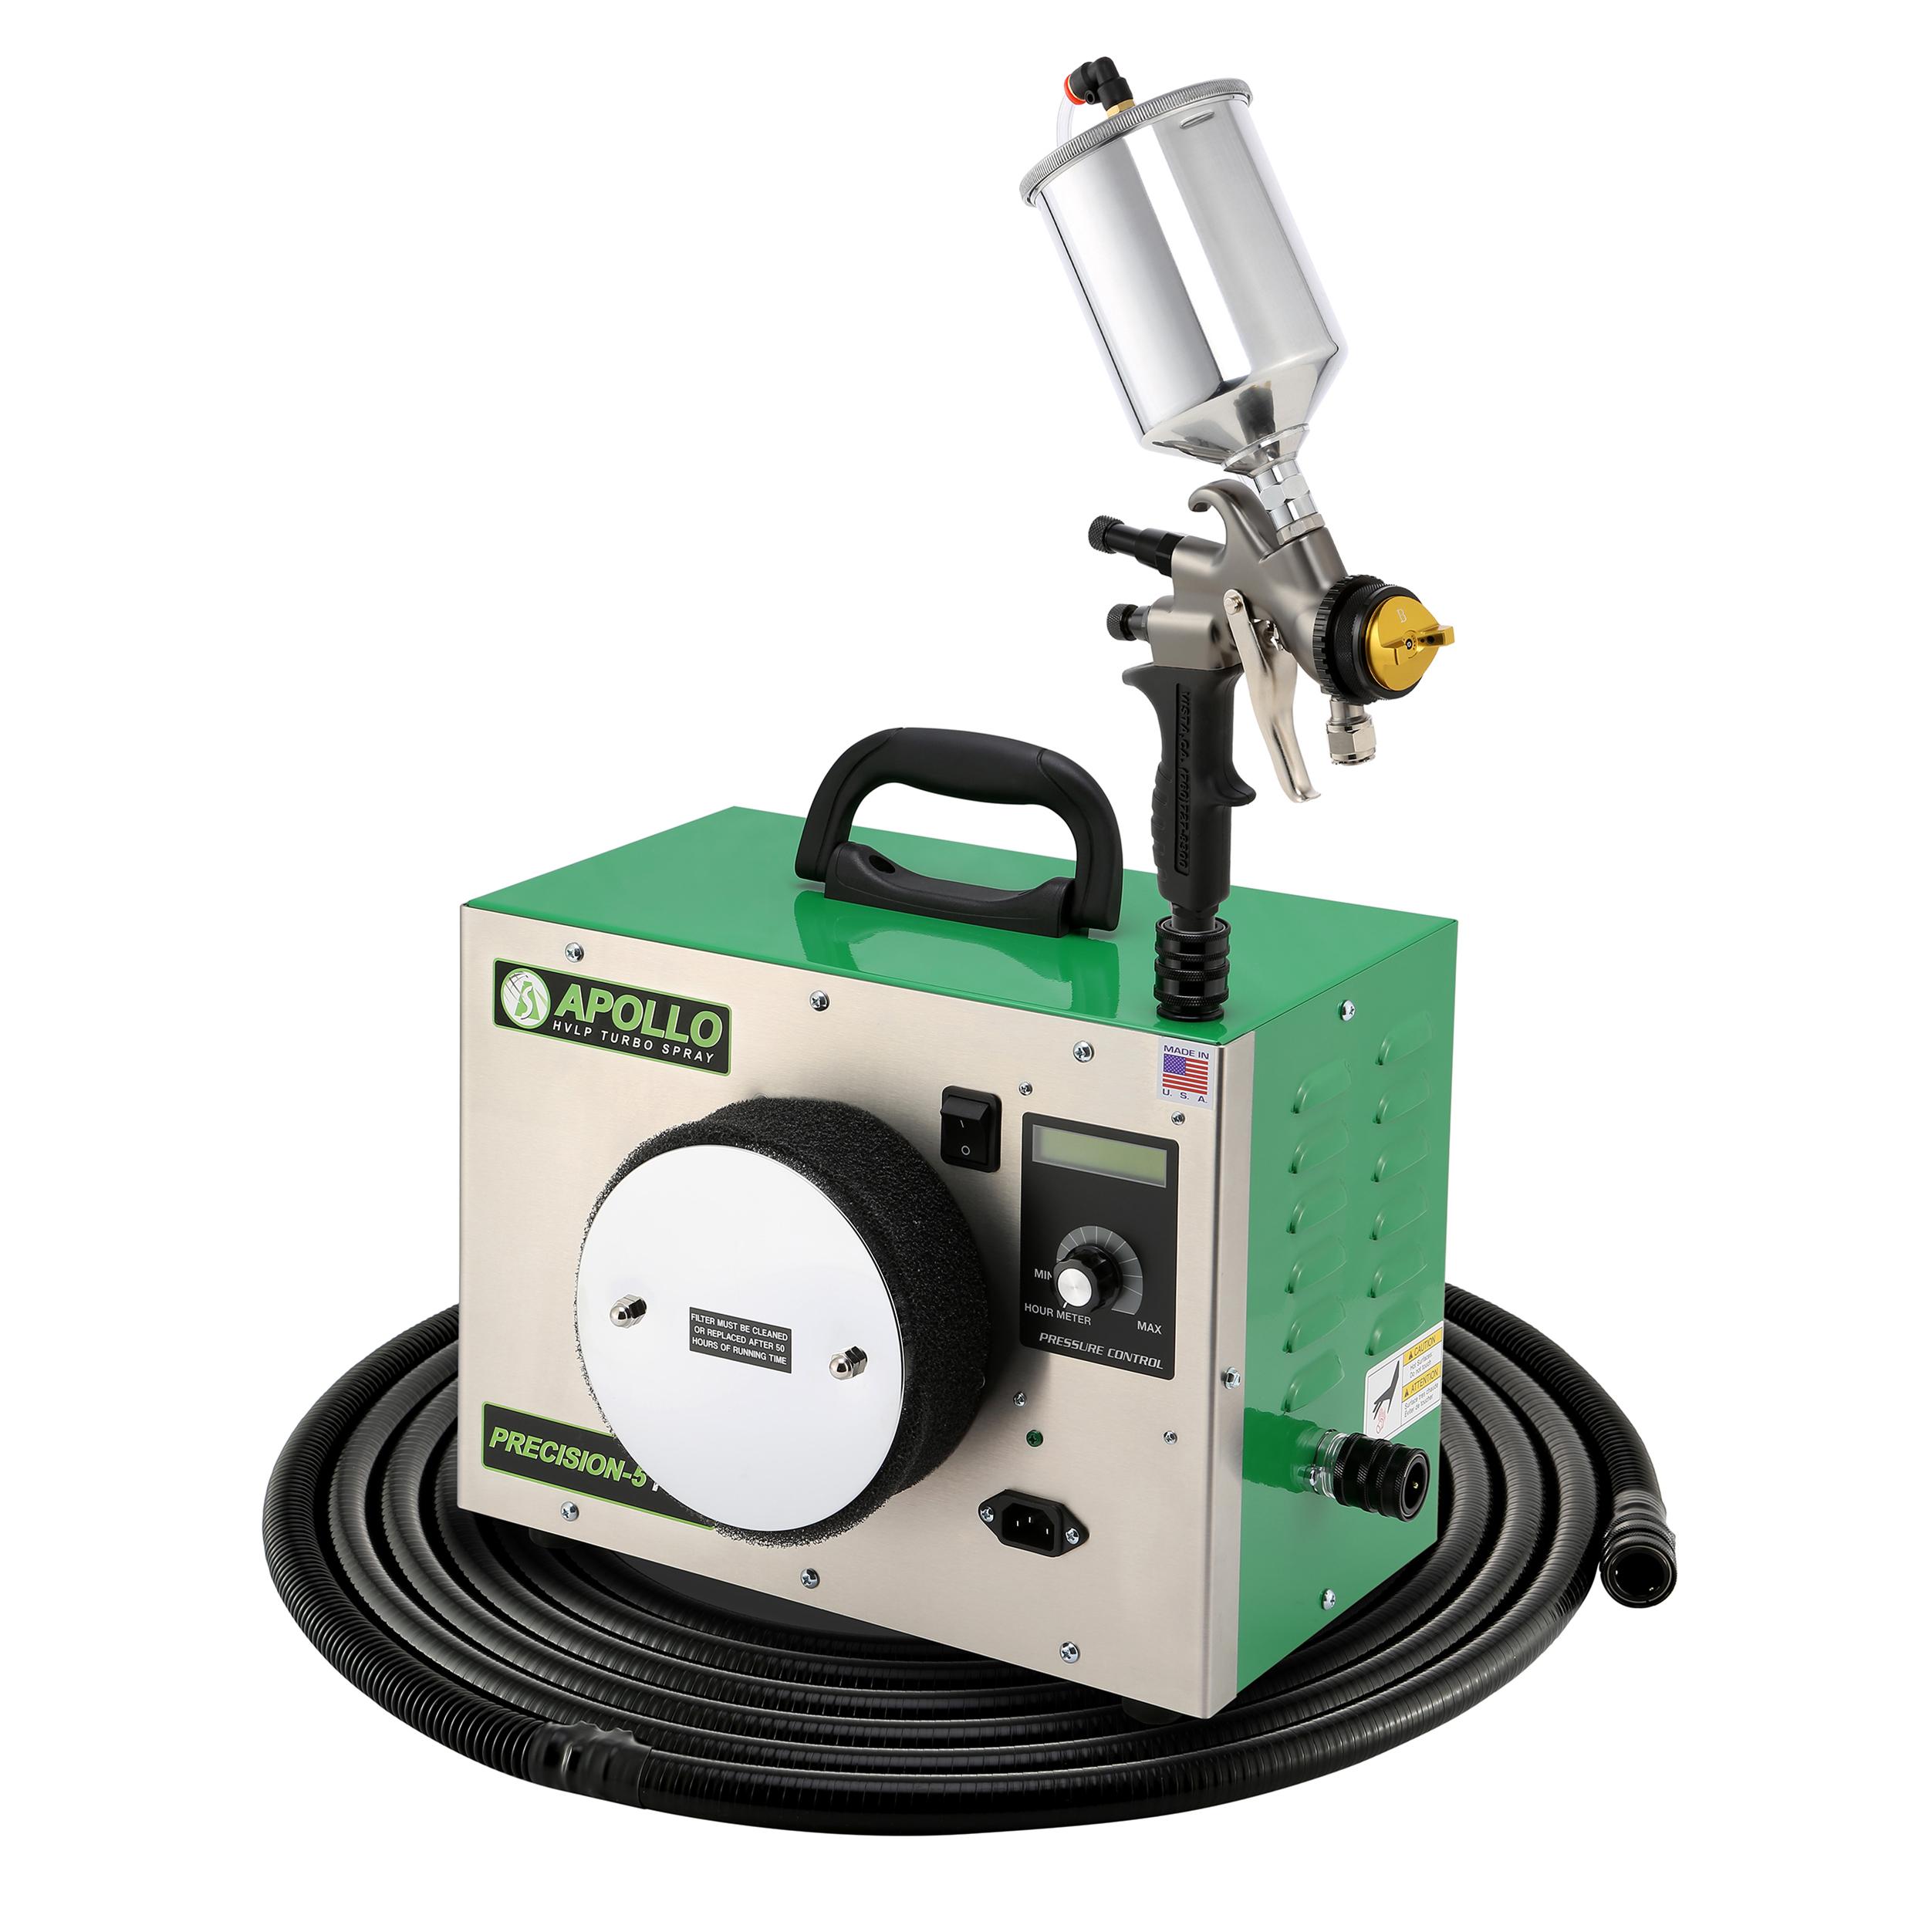 Precision-5 PRO HVLP Turbospray System with Gravity Feed Spray Gun